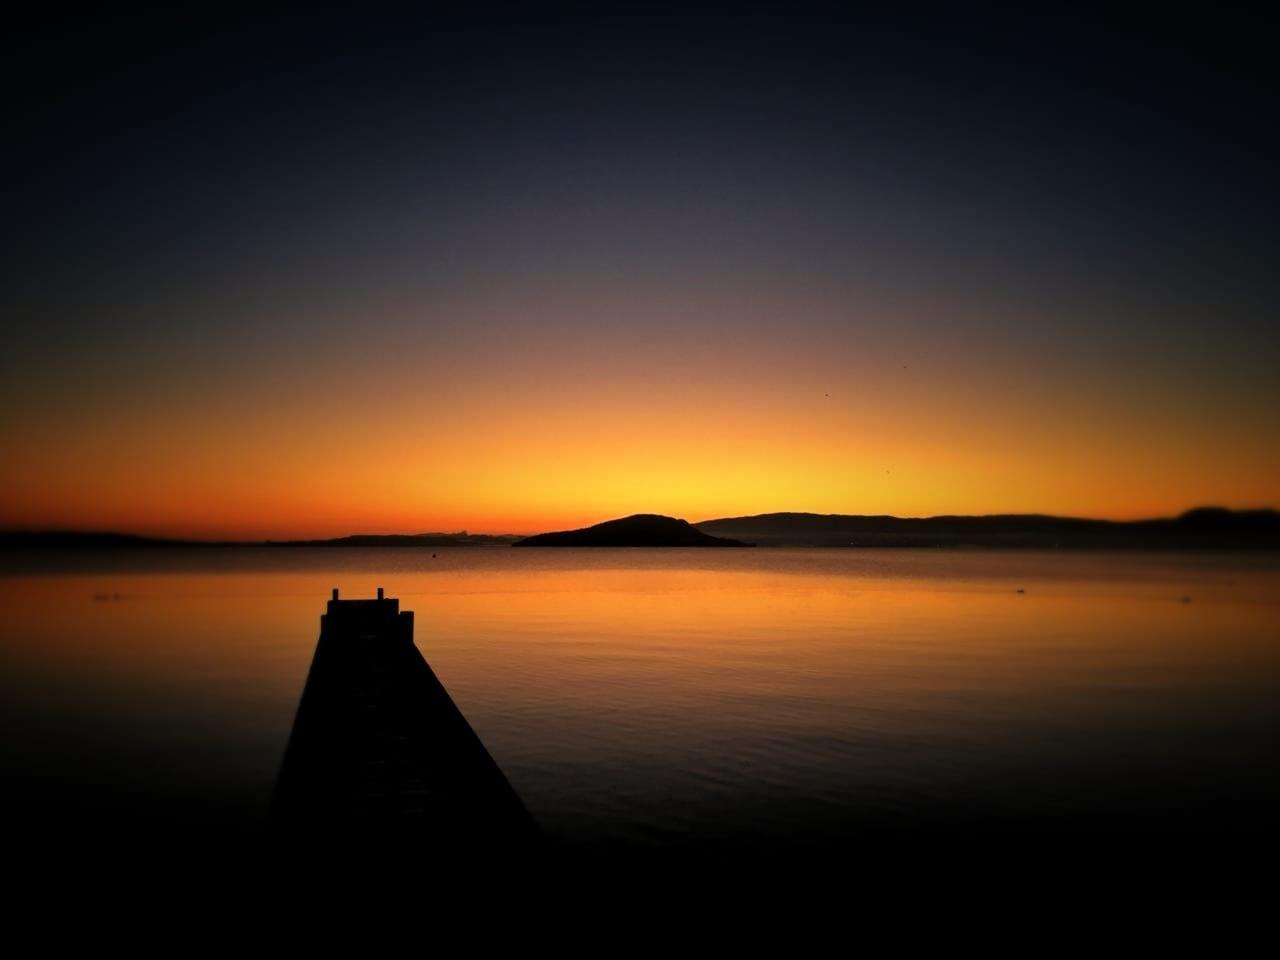 Sunrise at Rotorua Lake, NZ by Kerstie Cooper